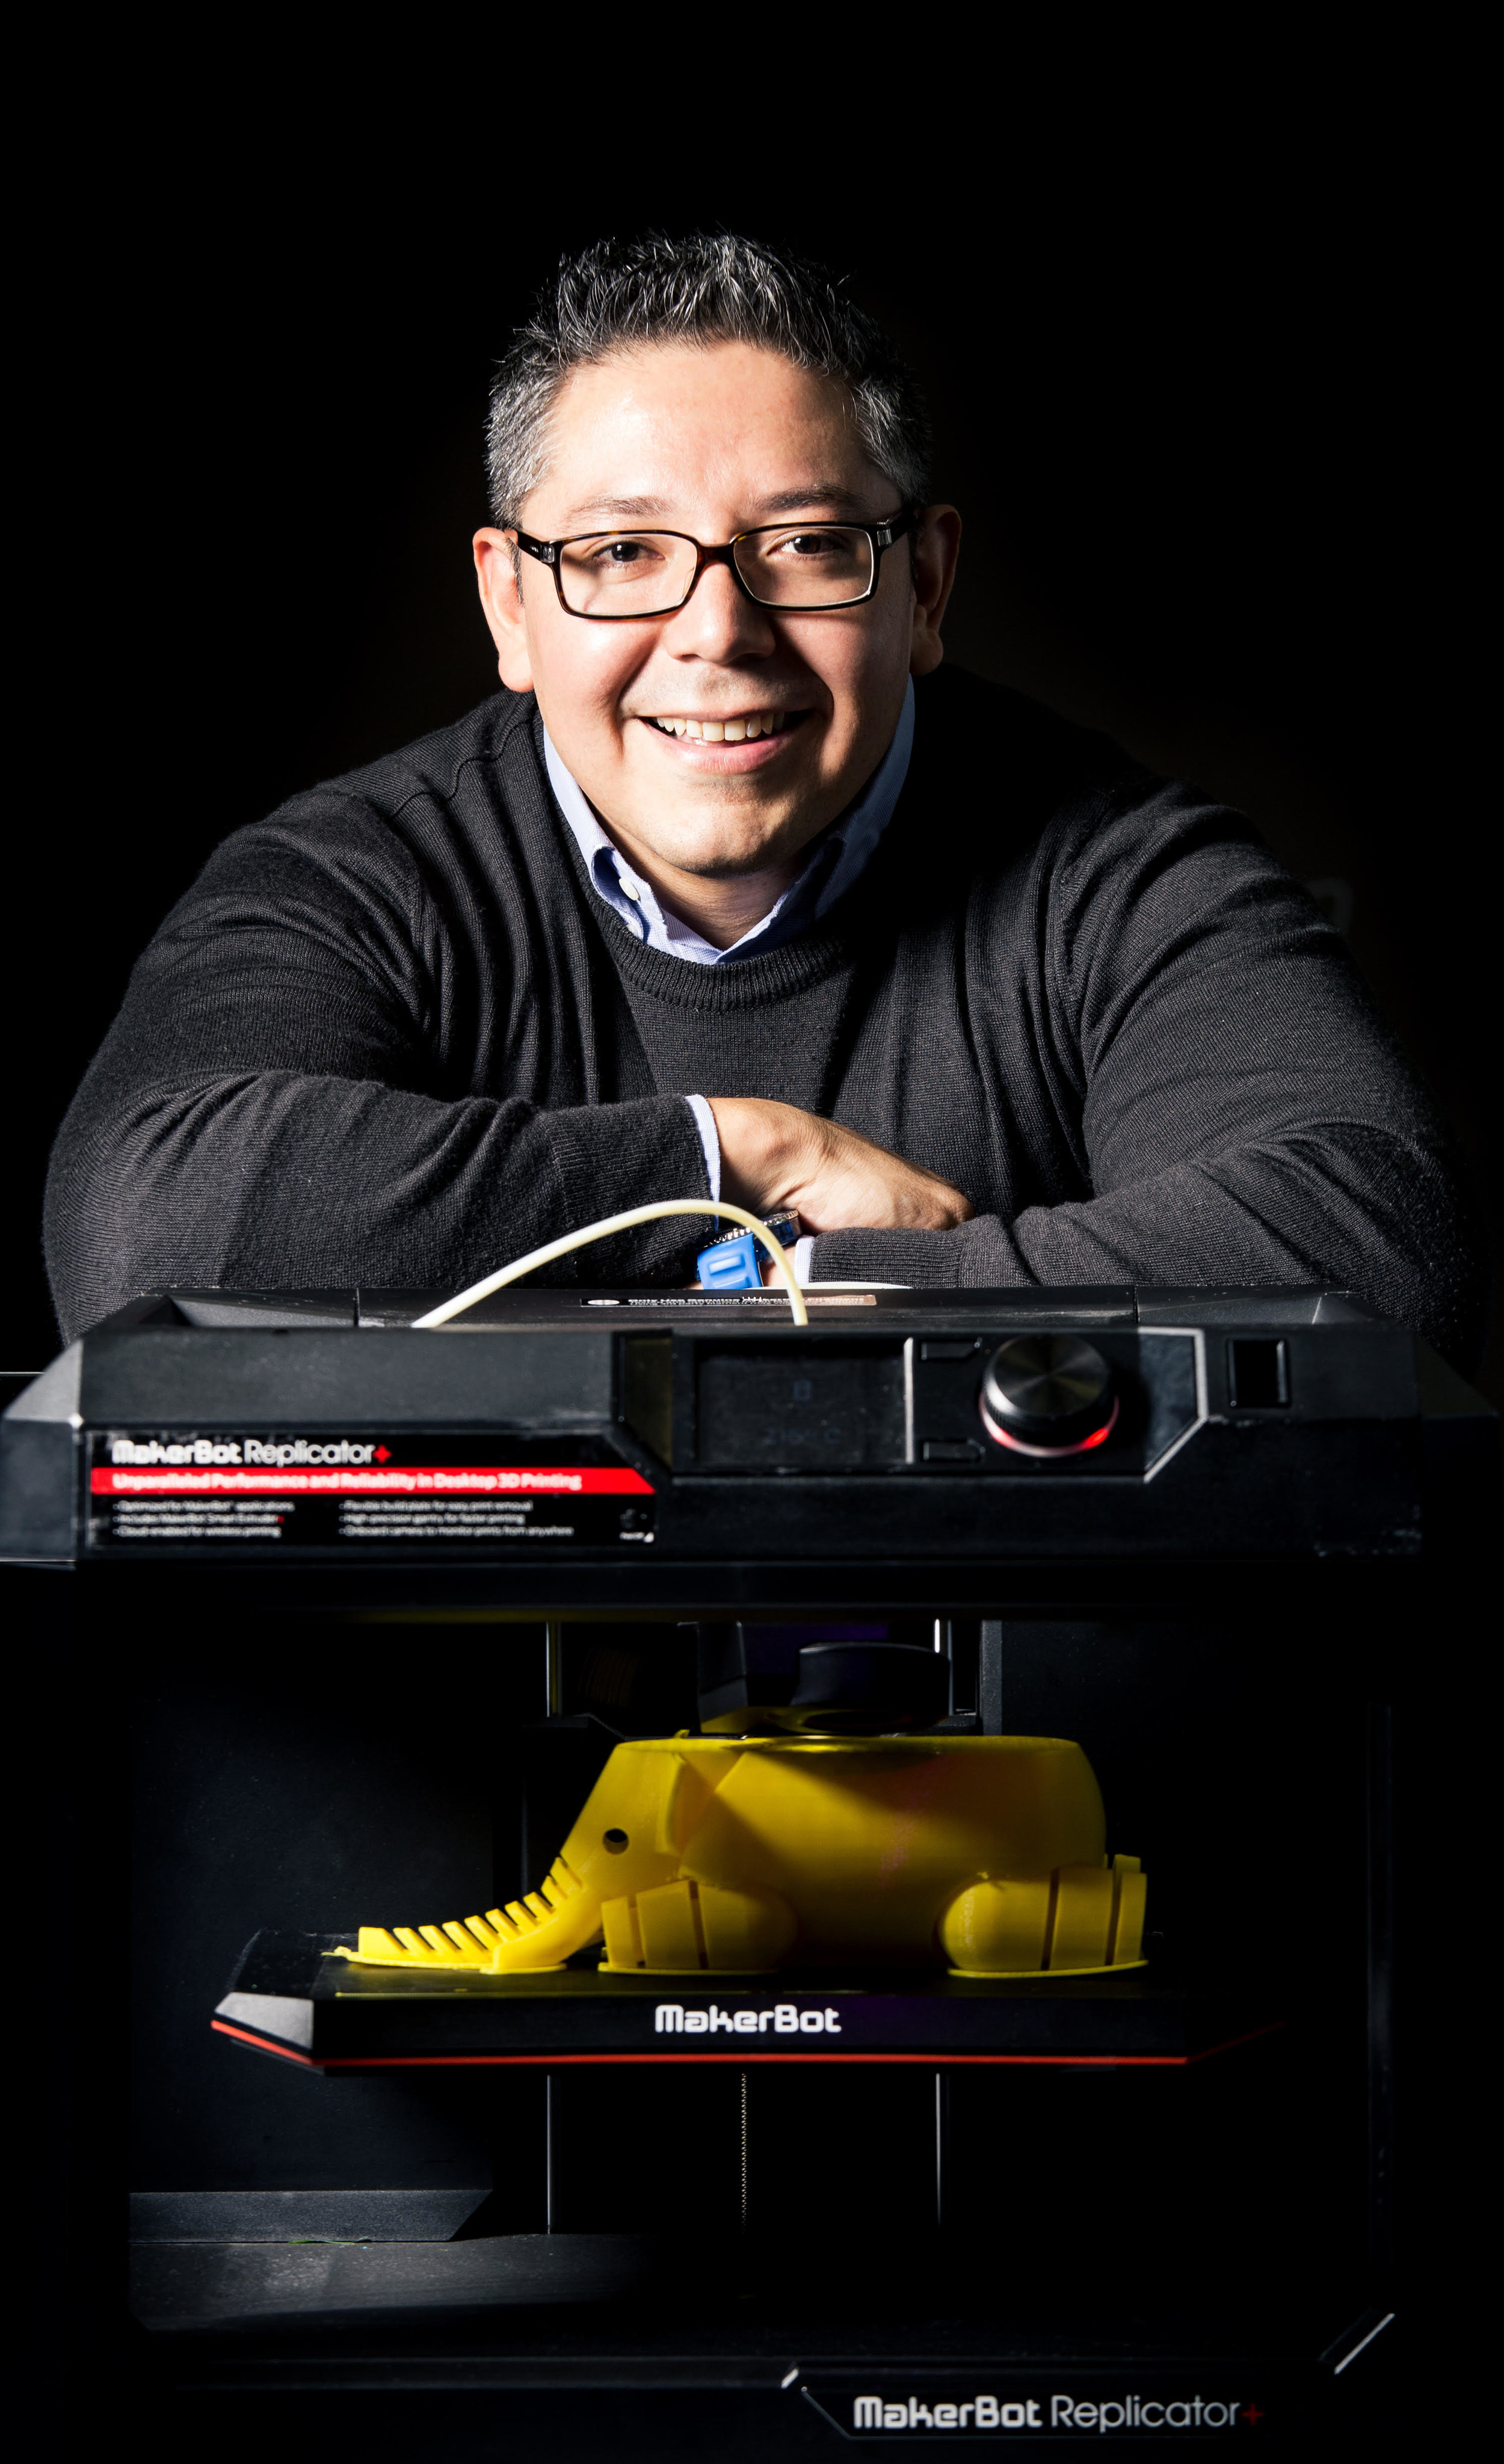 Felipe Rosales, Director General de MakerBot en Latinoamérica.